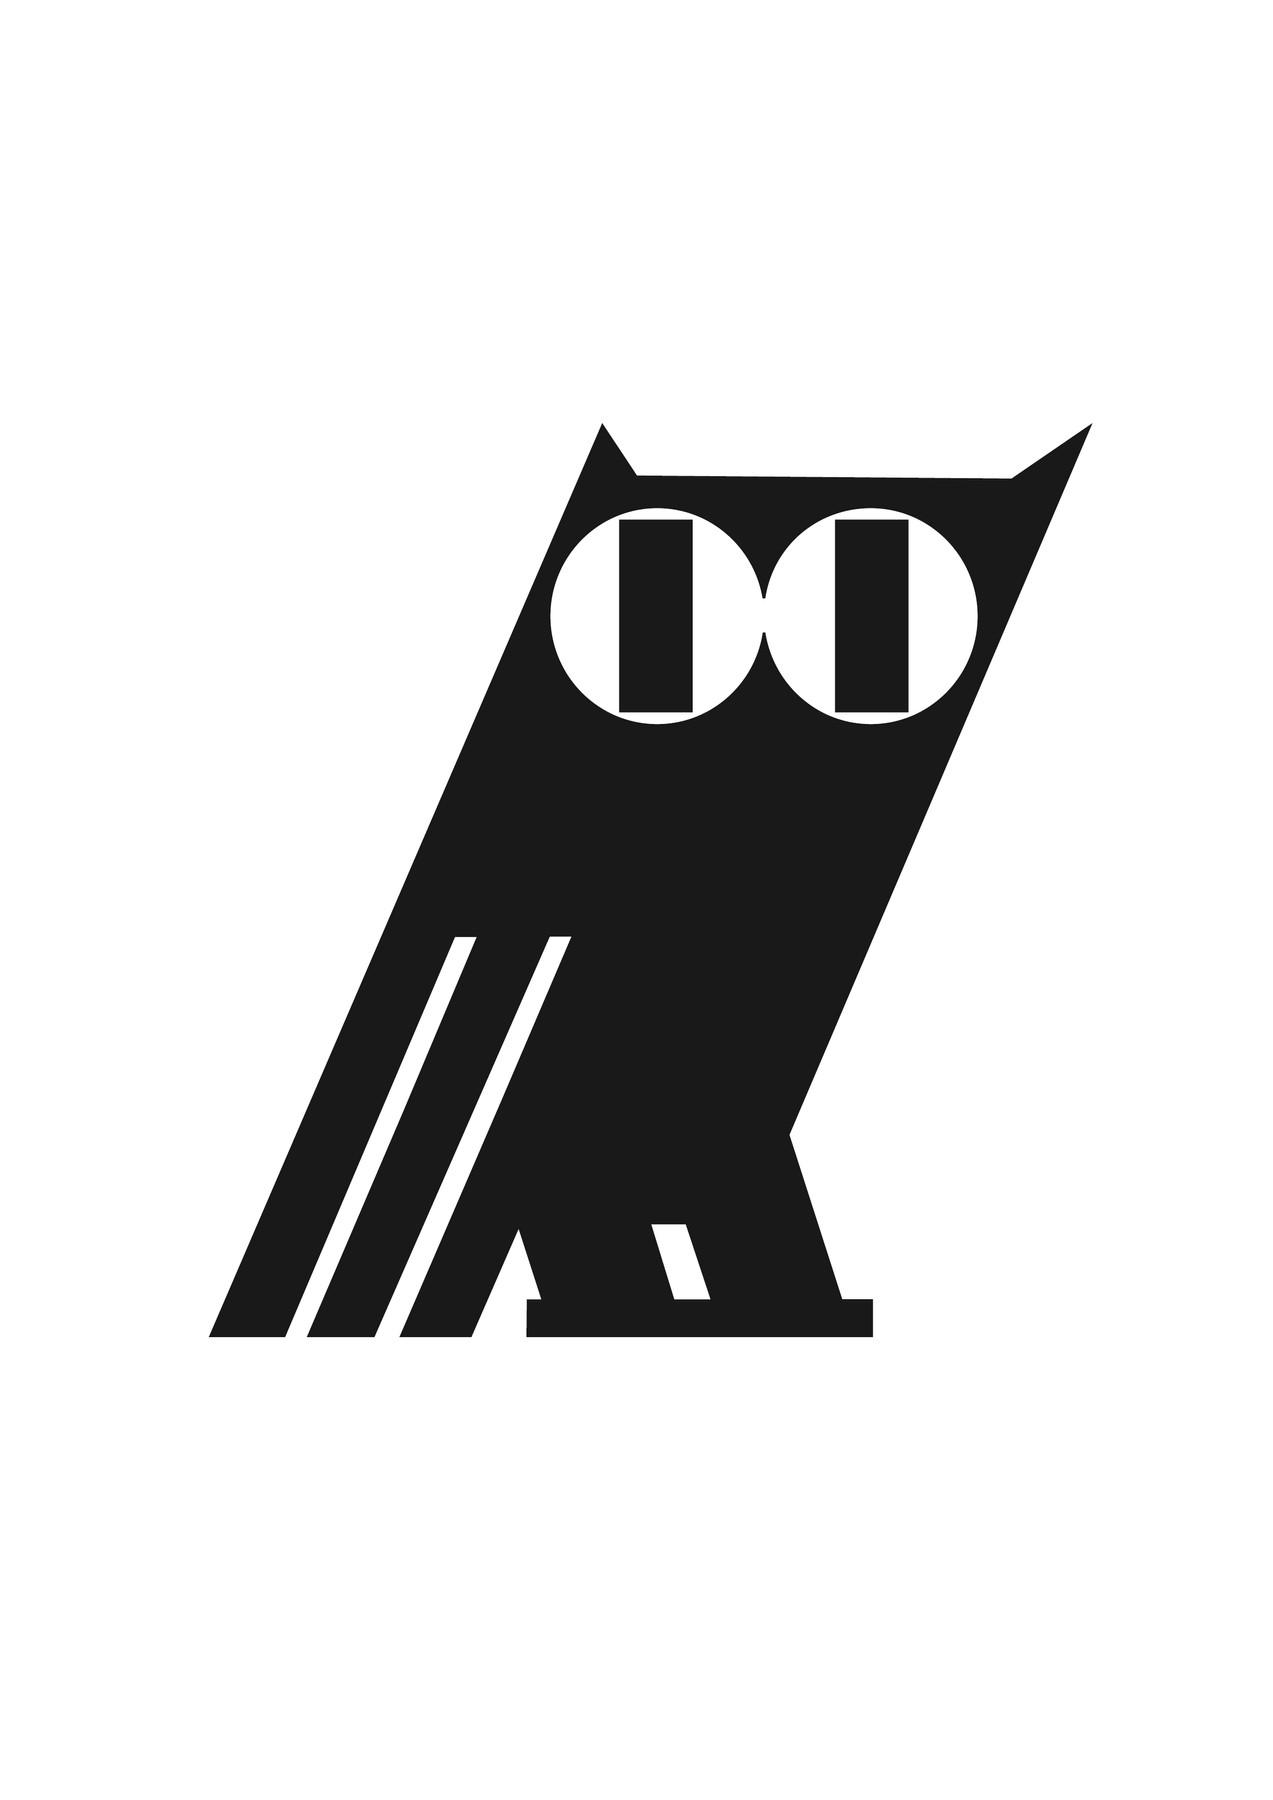 wilhelm-deffke-modern-logo-design-8.jpg